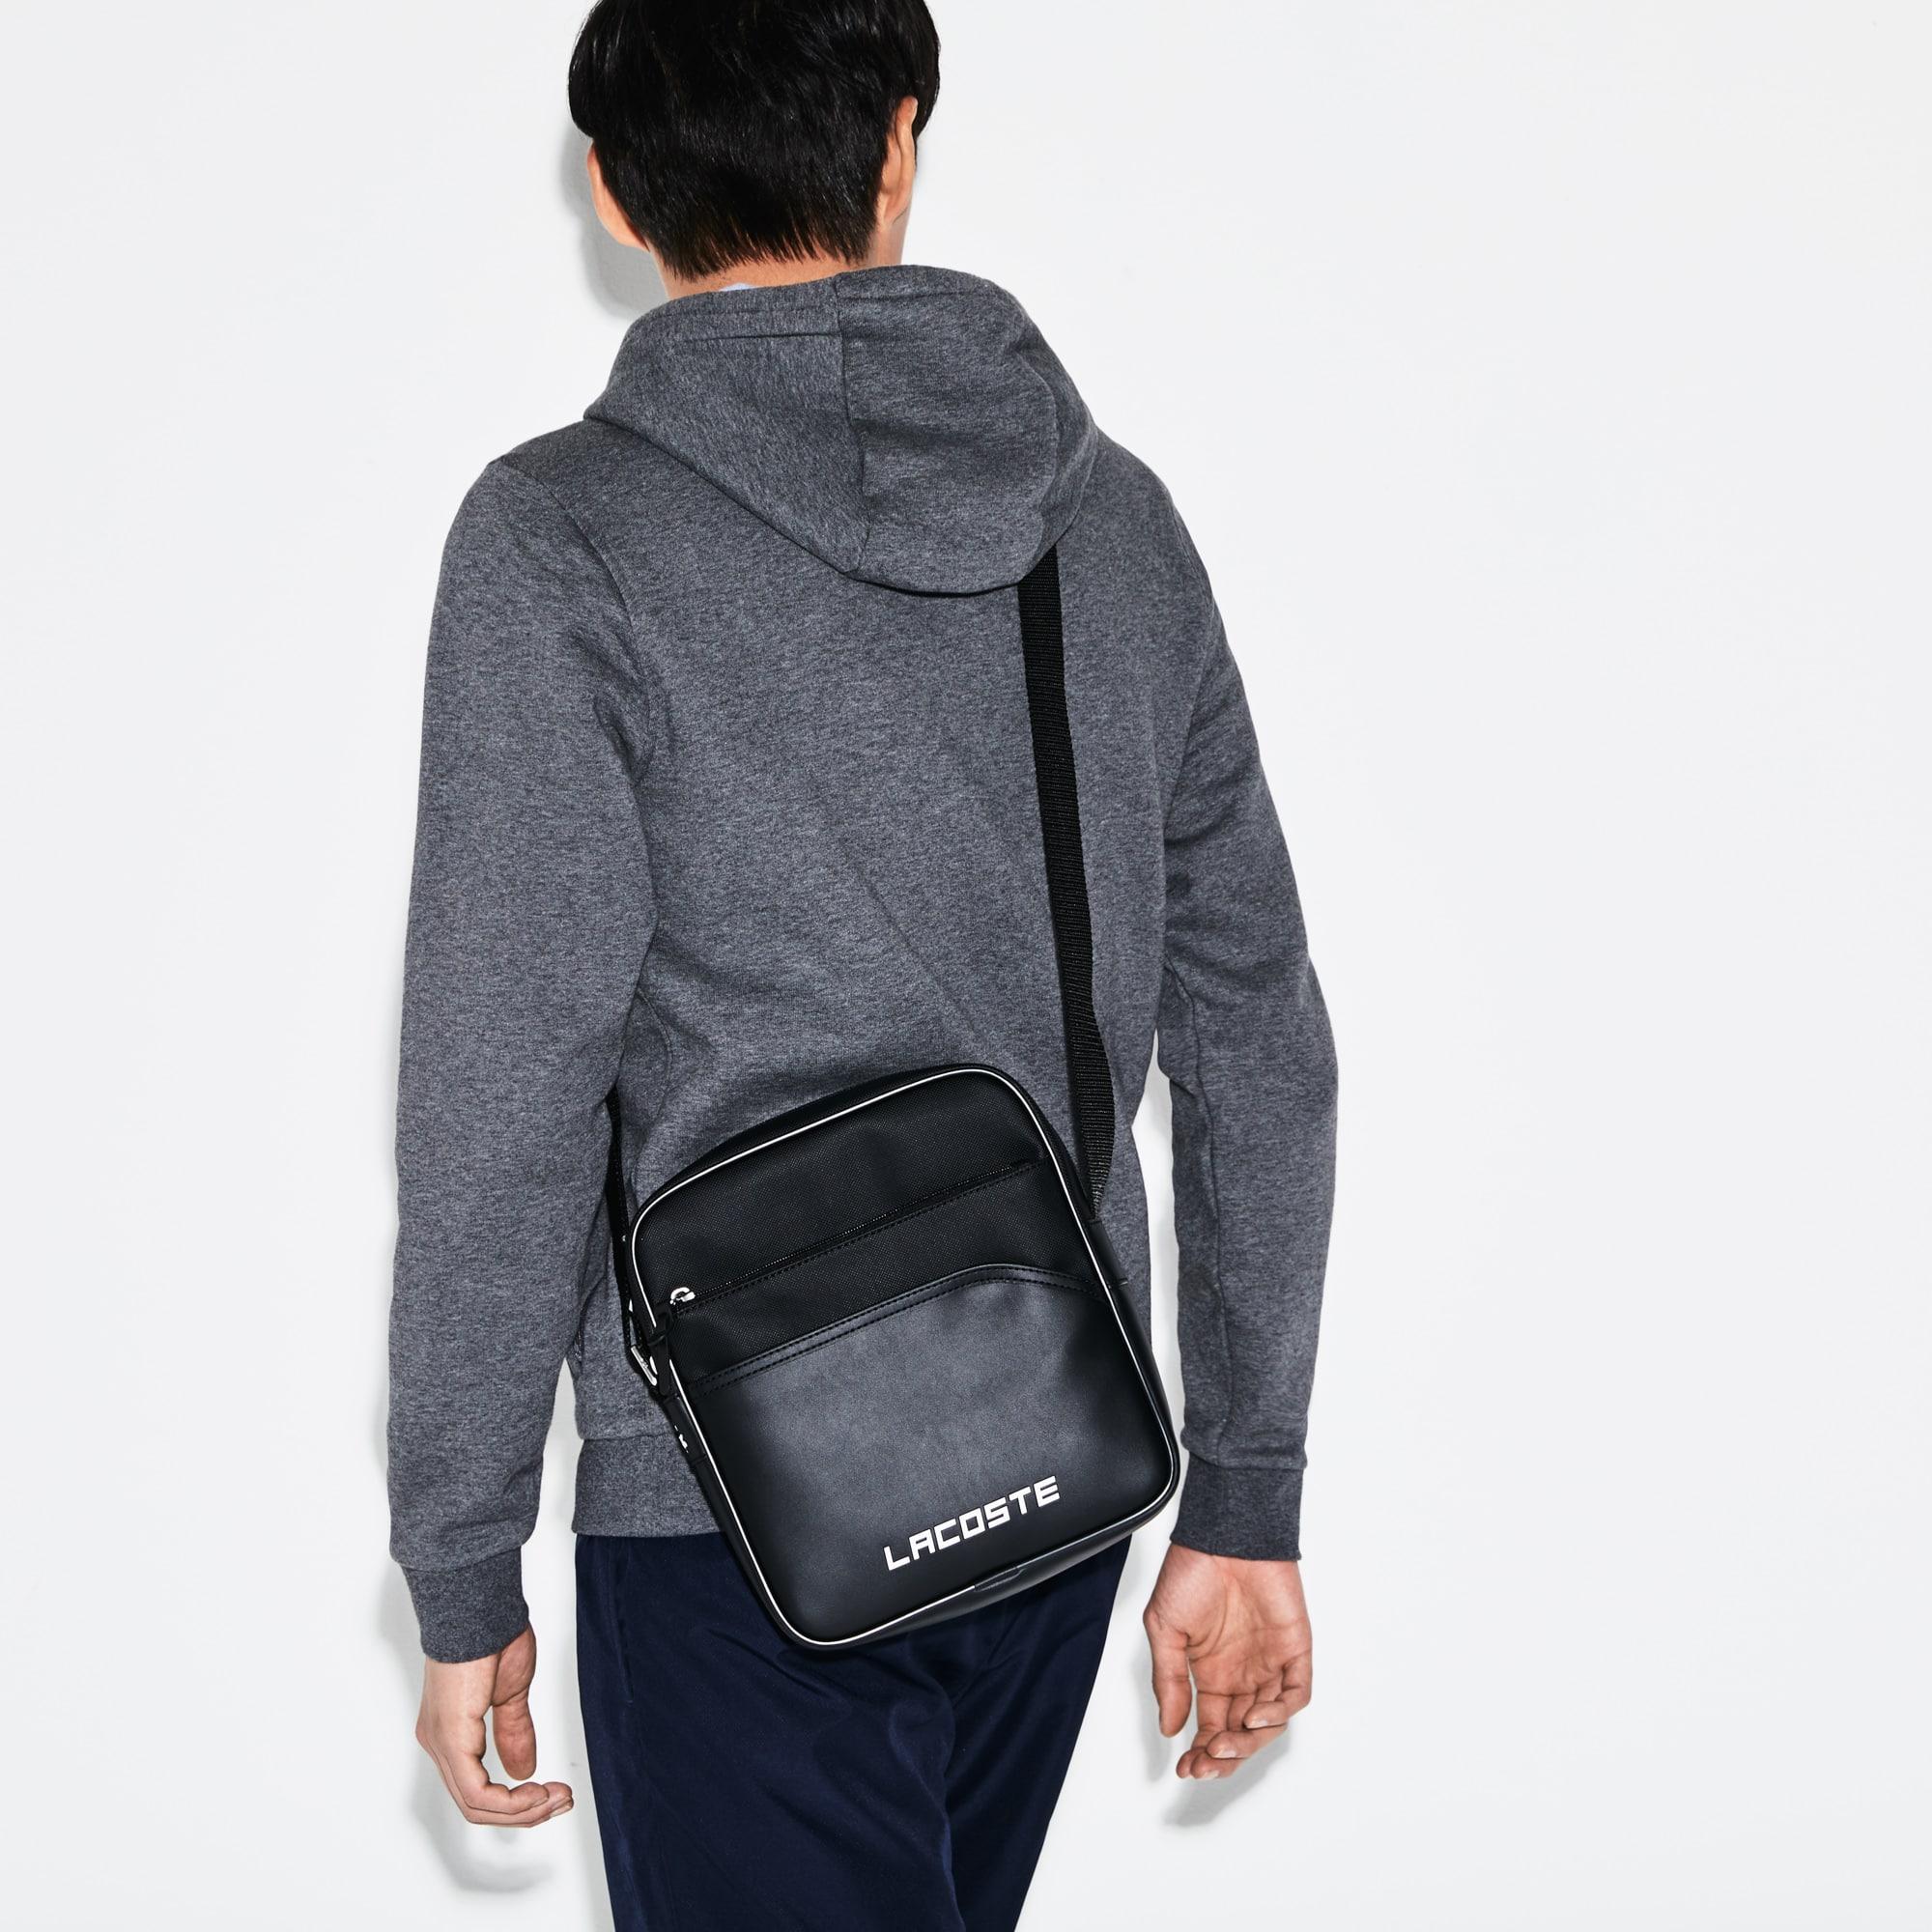 Men's SPORT Ultimum Lacoste Lettering Zip Bag